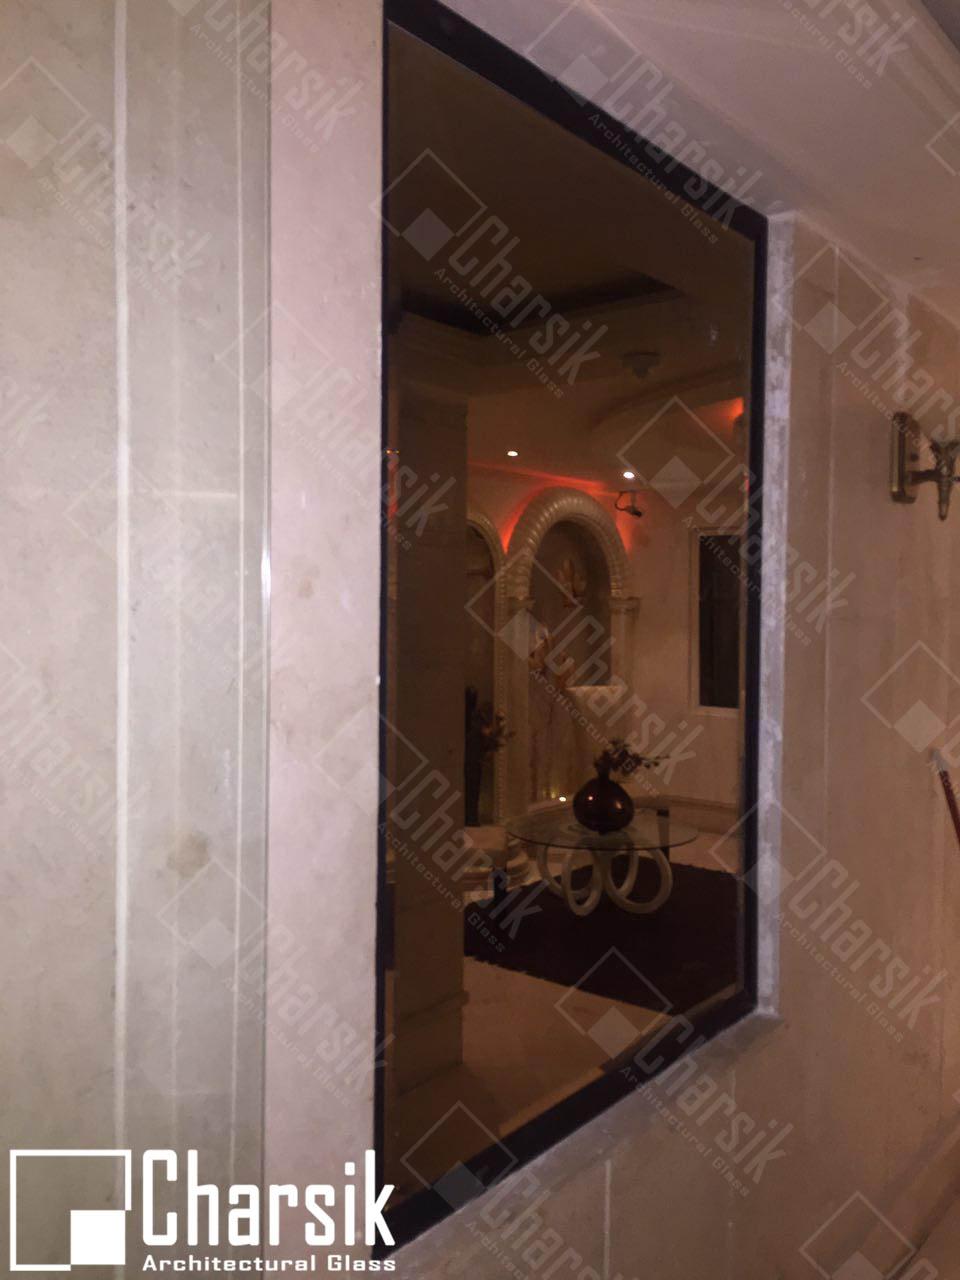 آینه تزئینی دیواری نیاوران چارسیک